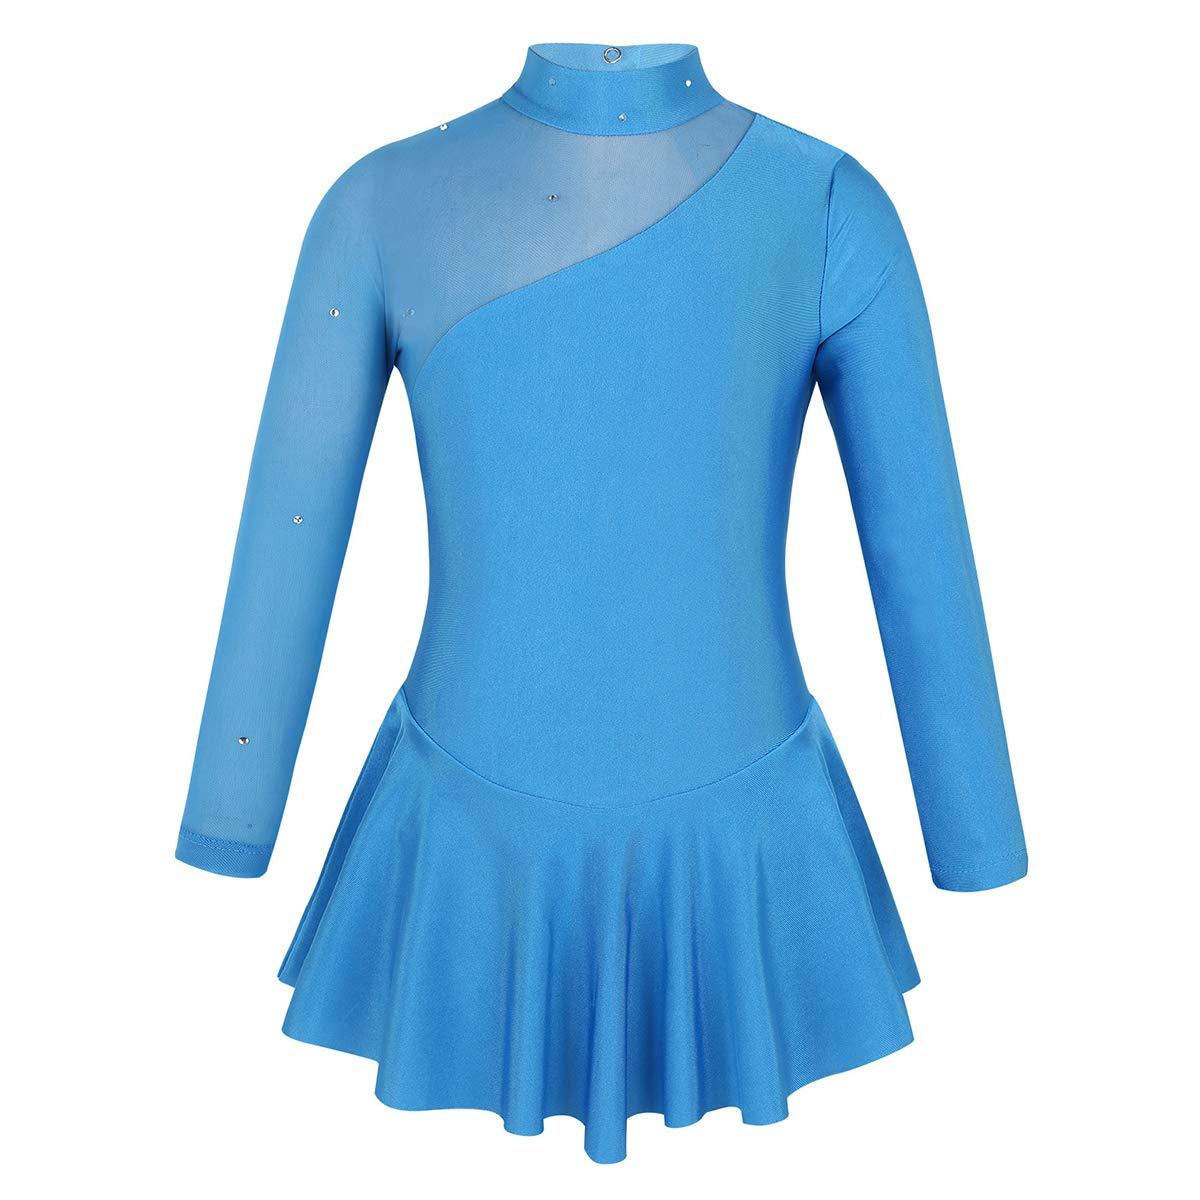 MSemis Kids Girls 2 Pieces Sequins Ballet Dance Dress Leotard Figure Ice Skating Dress Stage Performance Dance Costume